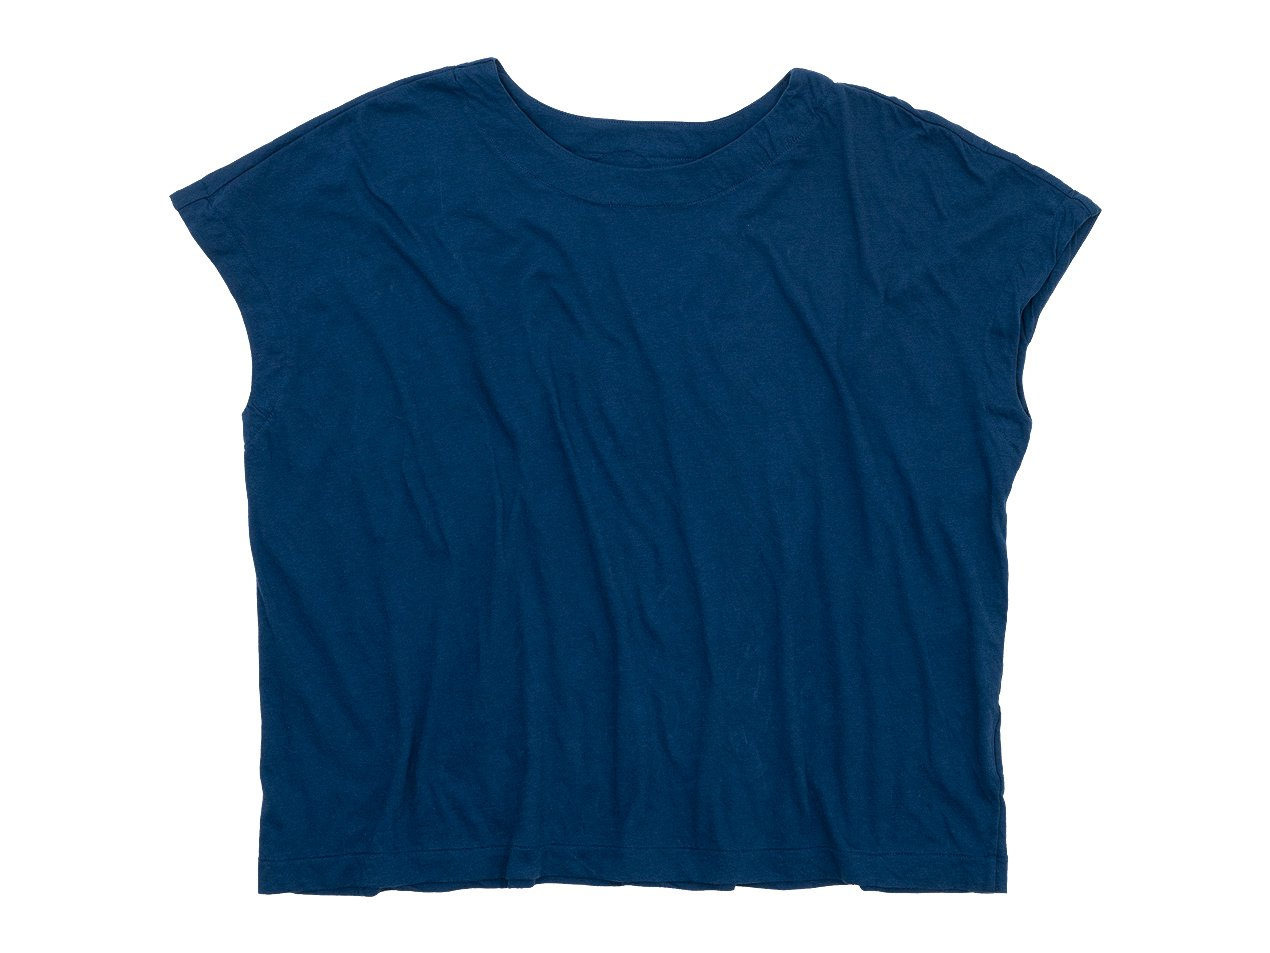 Atelier d'antan Peel(ピール) Cotton No Sleeve T-Shirt NAVY